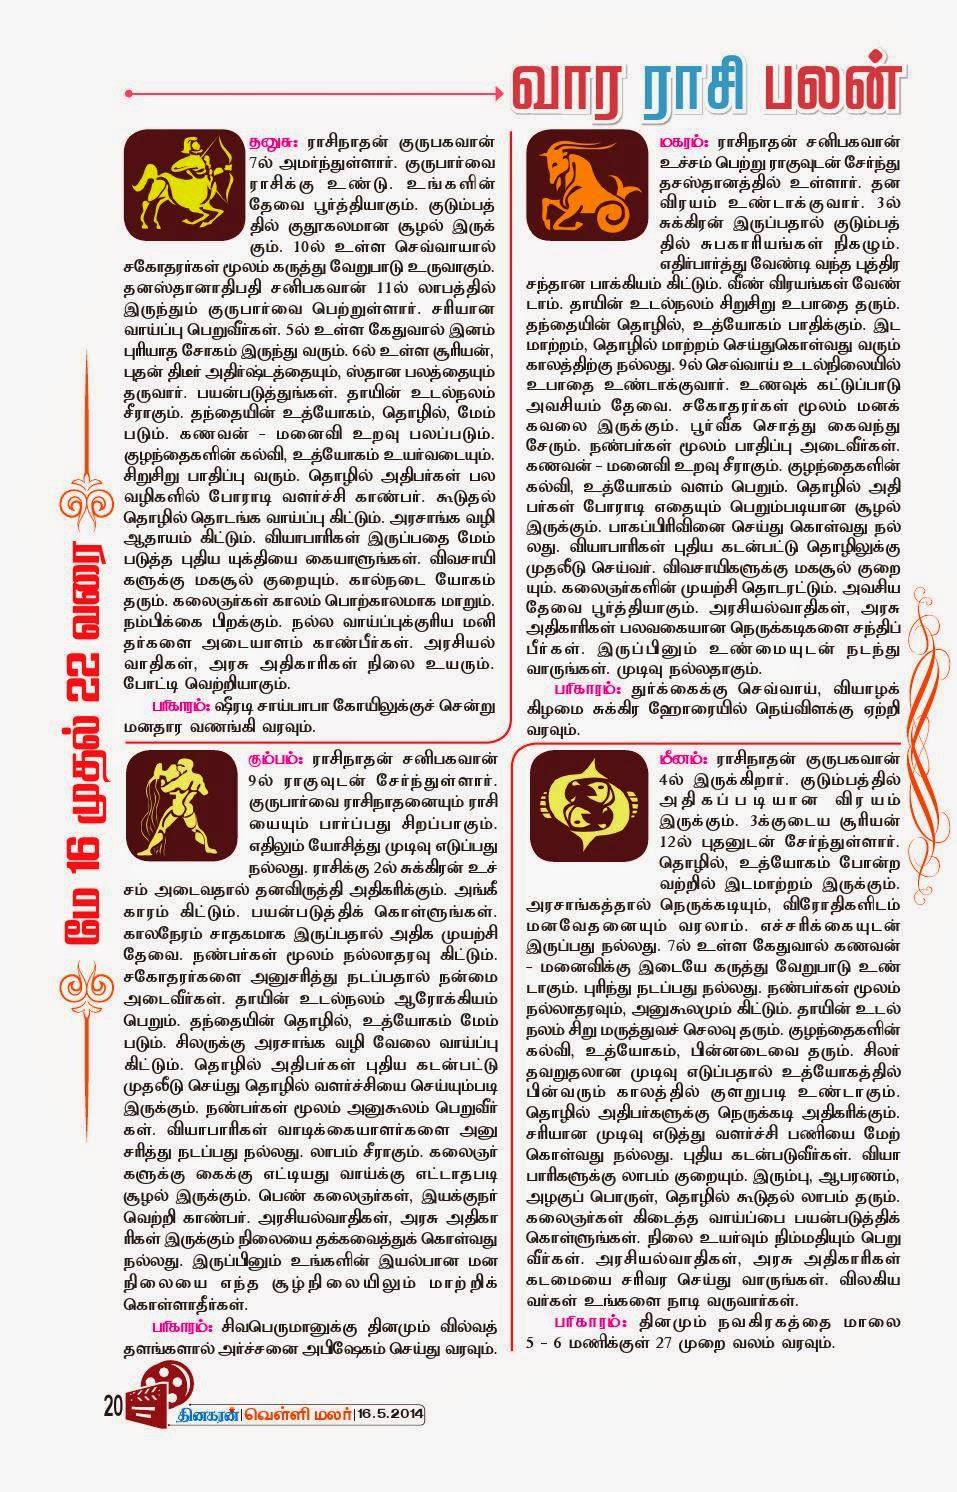 Download image 2014 Weekly Tamil Rasi Palan PC, Android, iPhone and